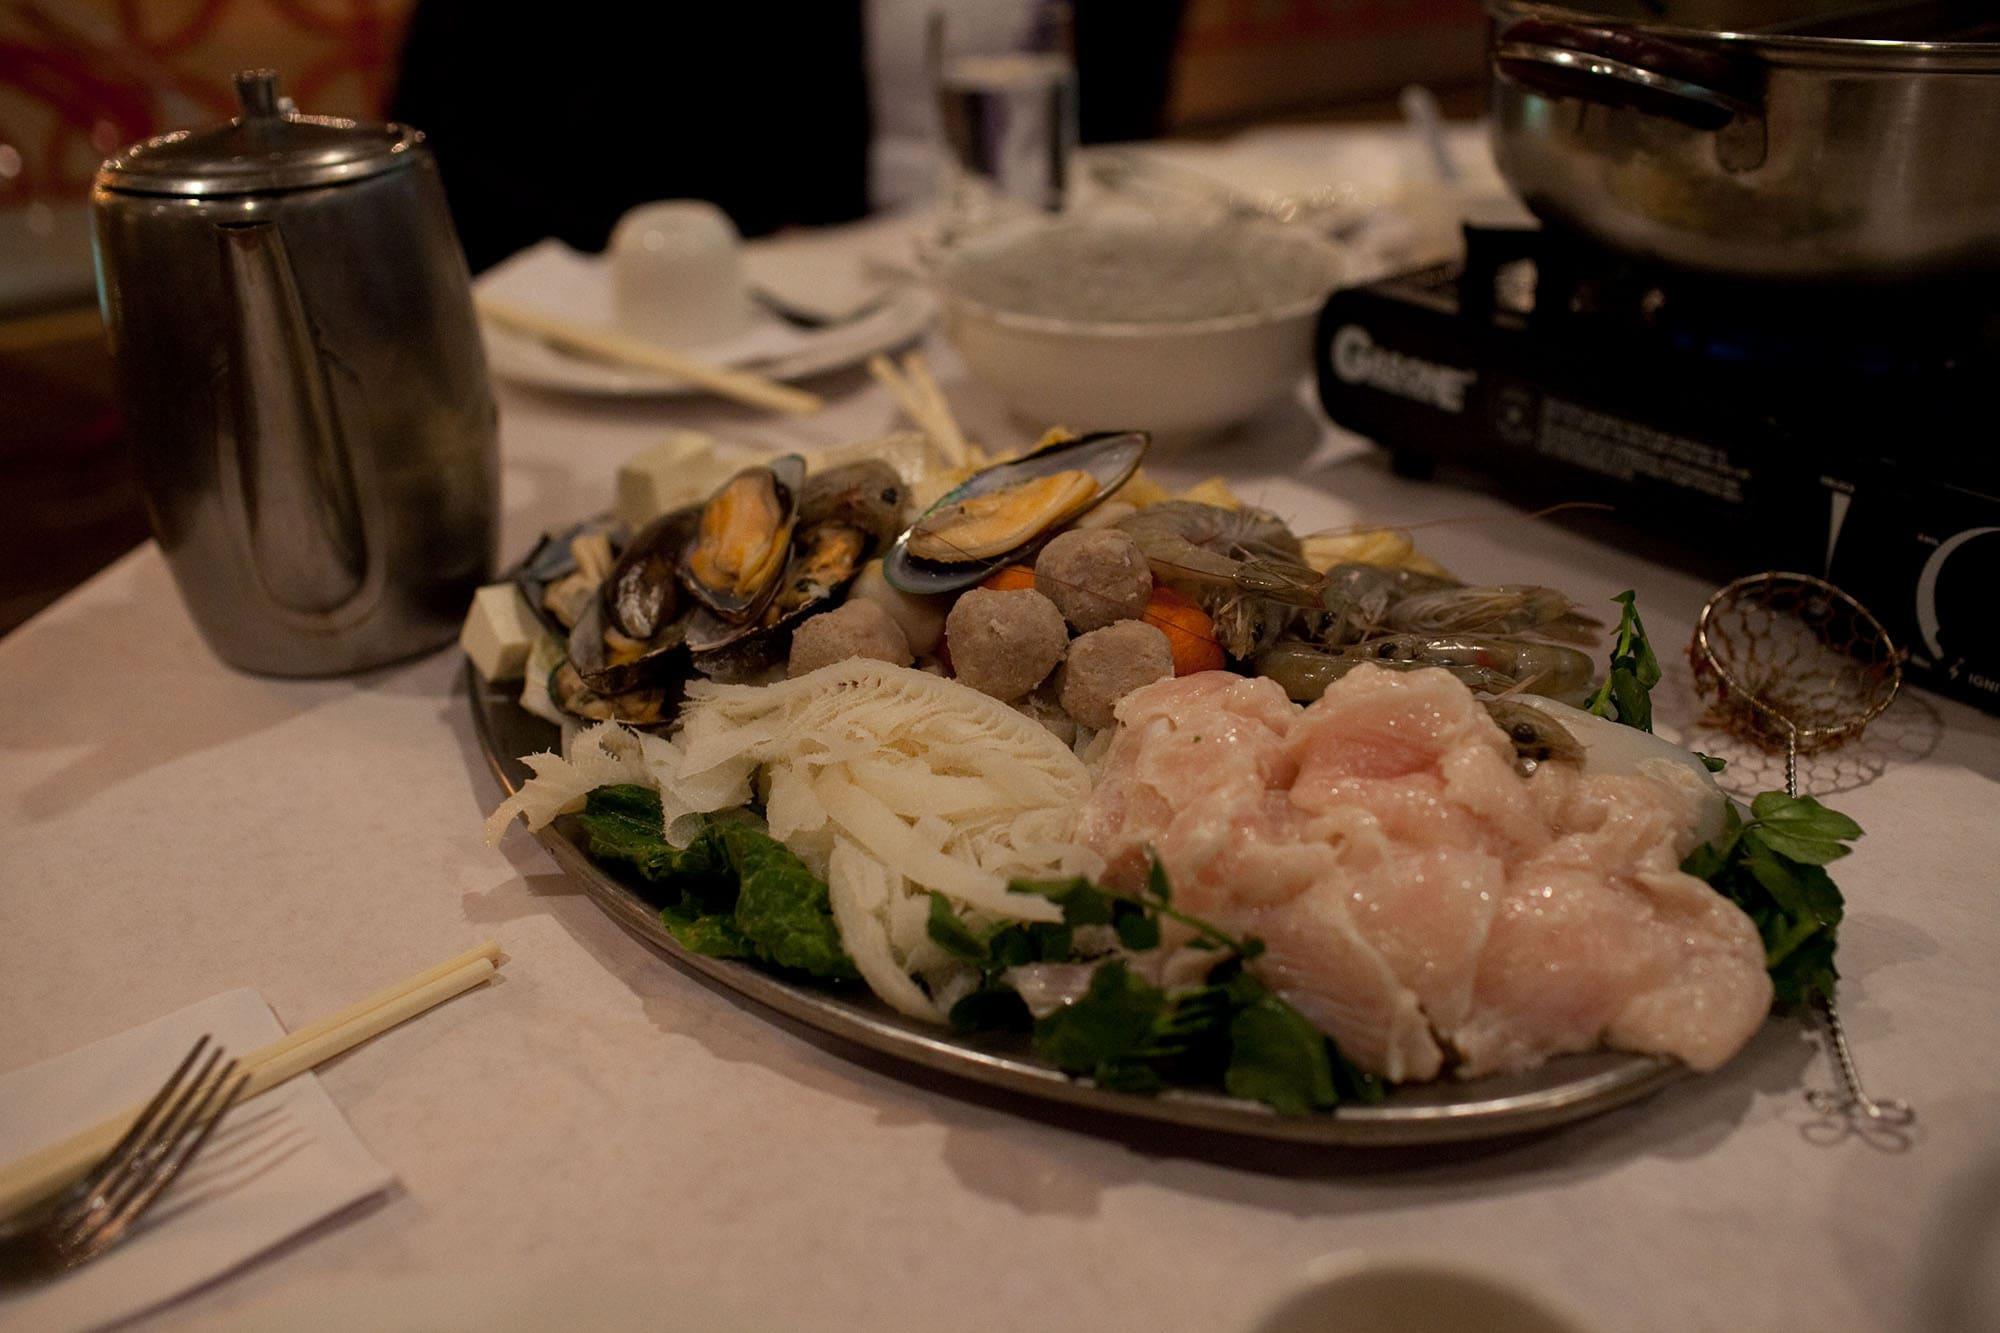 Seafood for the hot pot at Lao Sze Chuan.